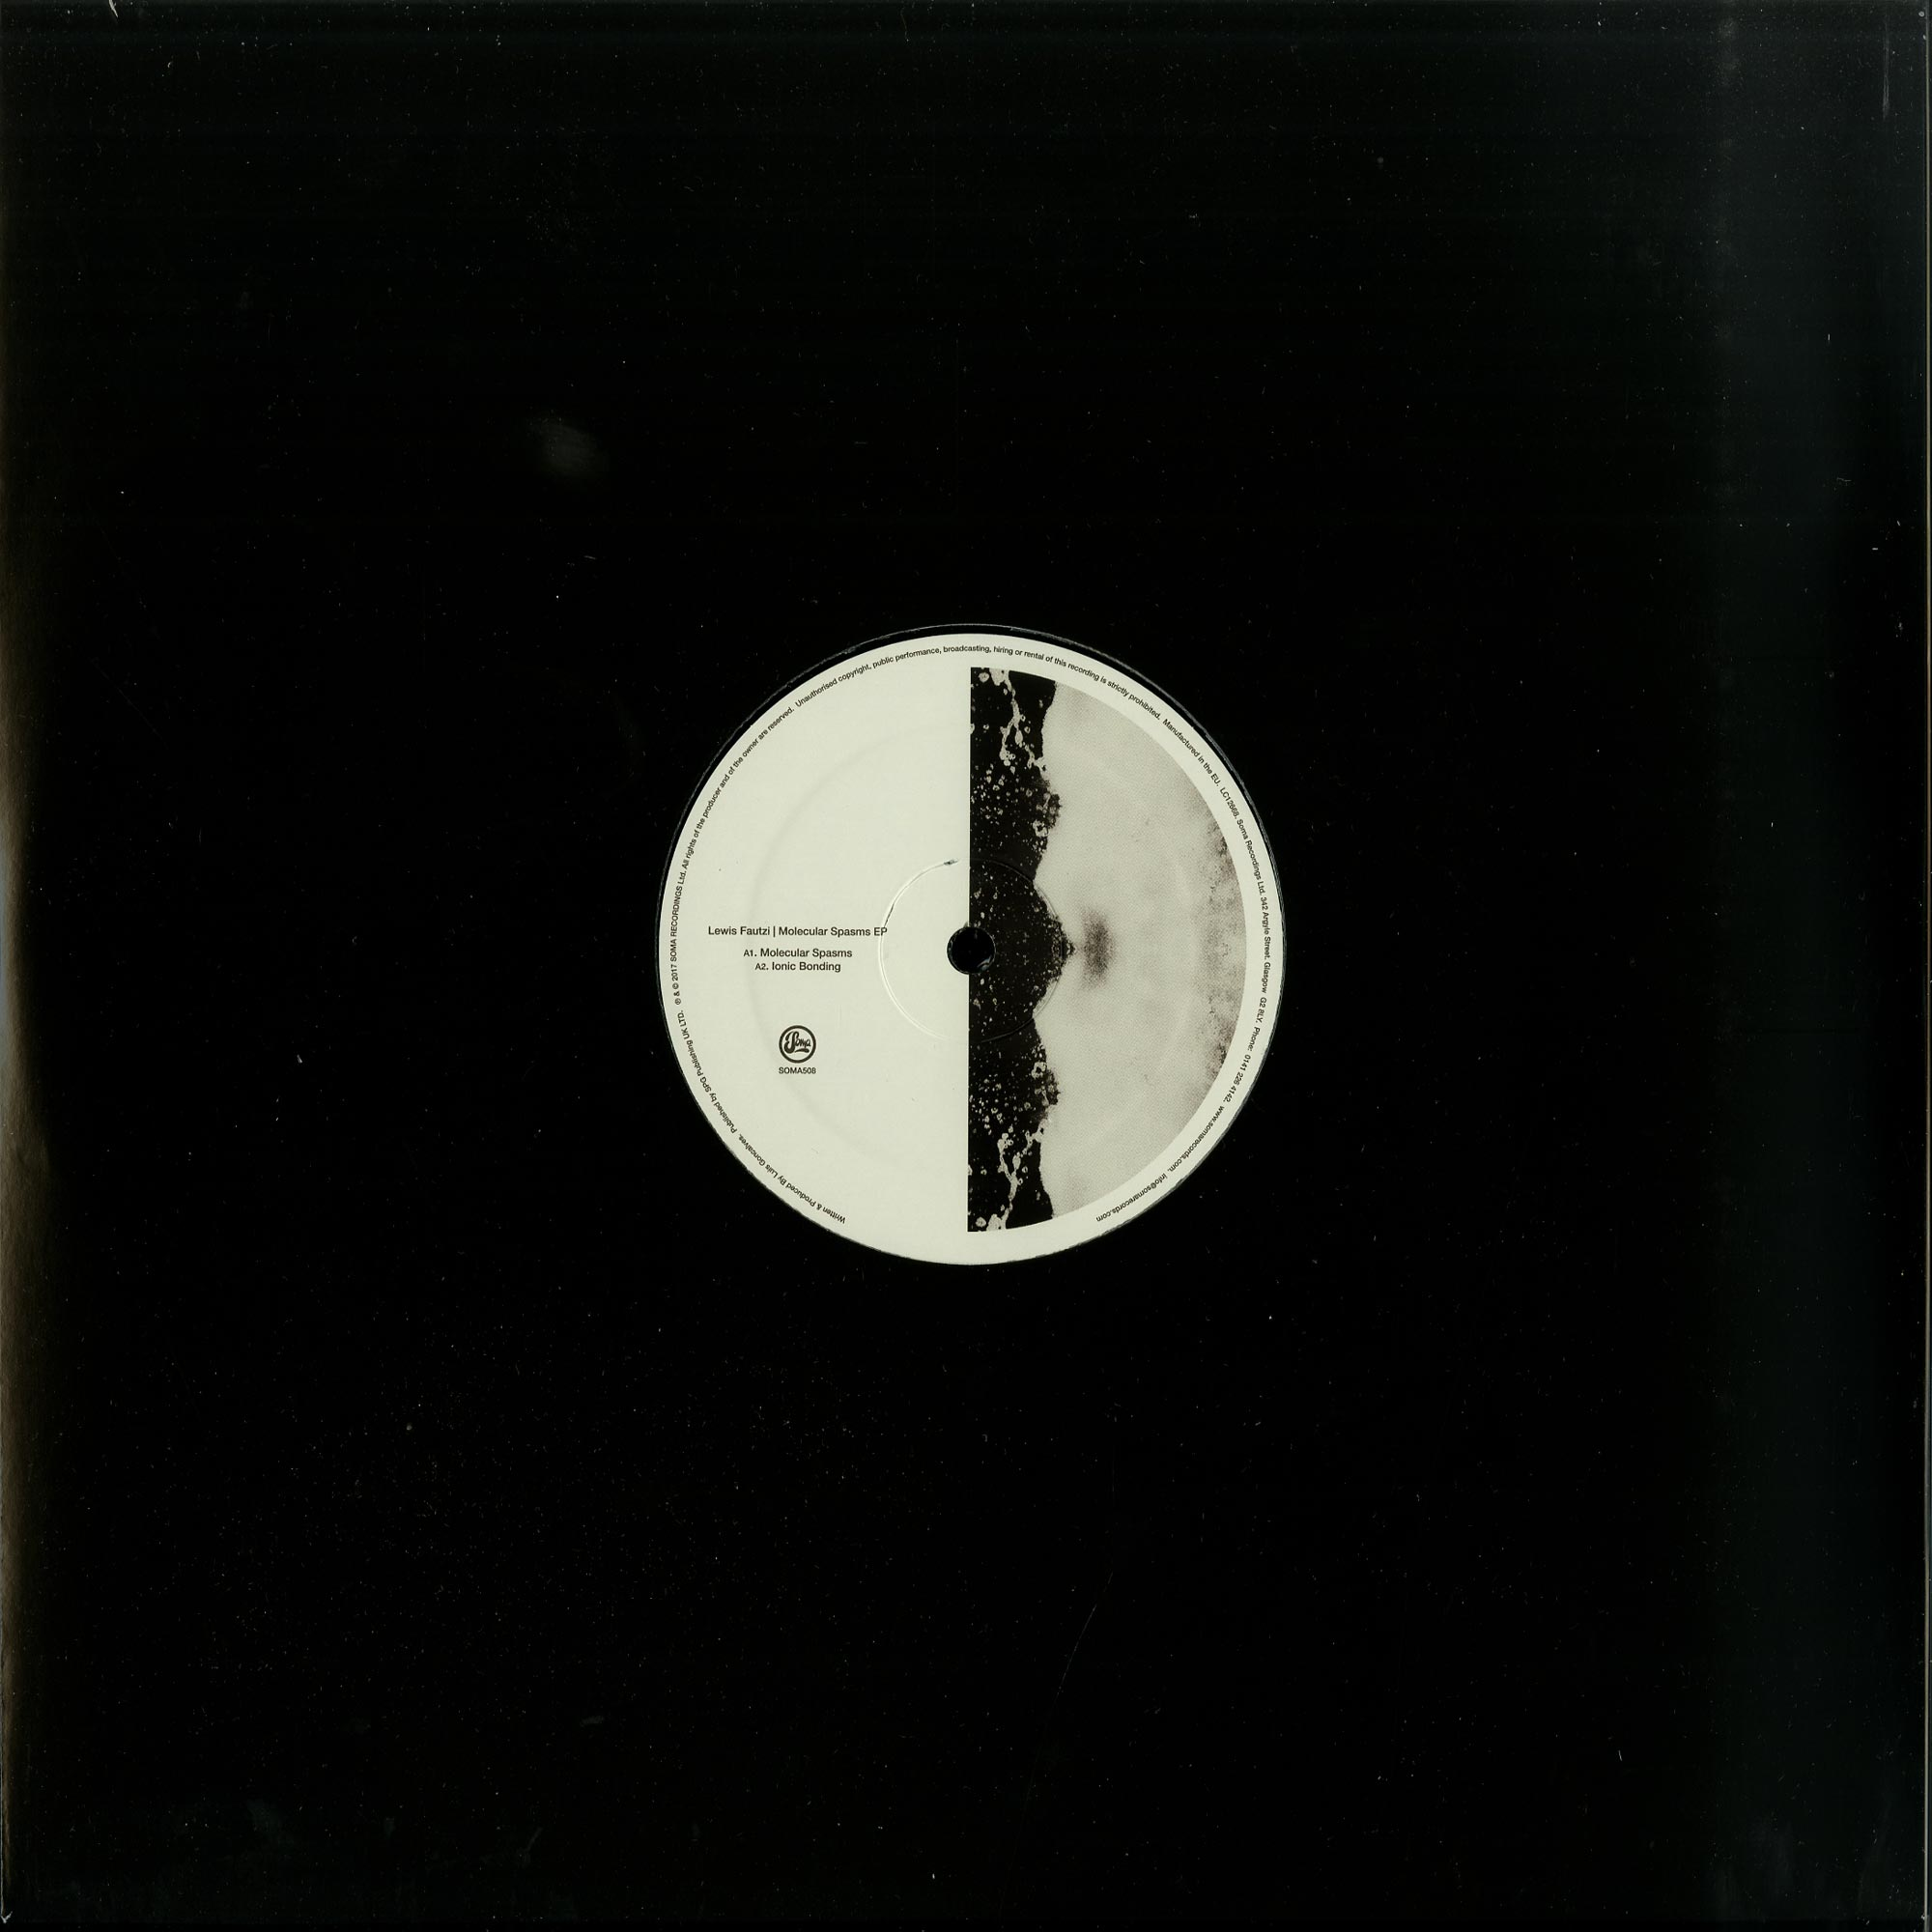 Lewis Fautzi - MOLECULAR SPASMS EP